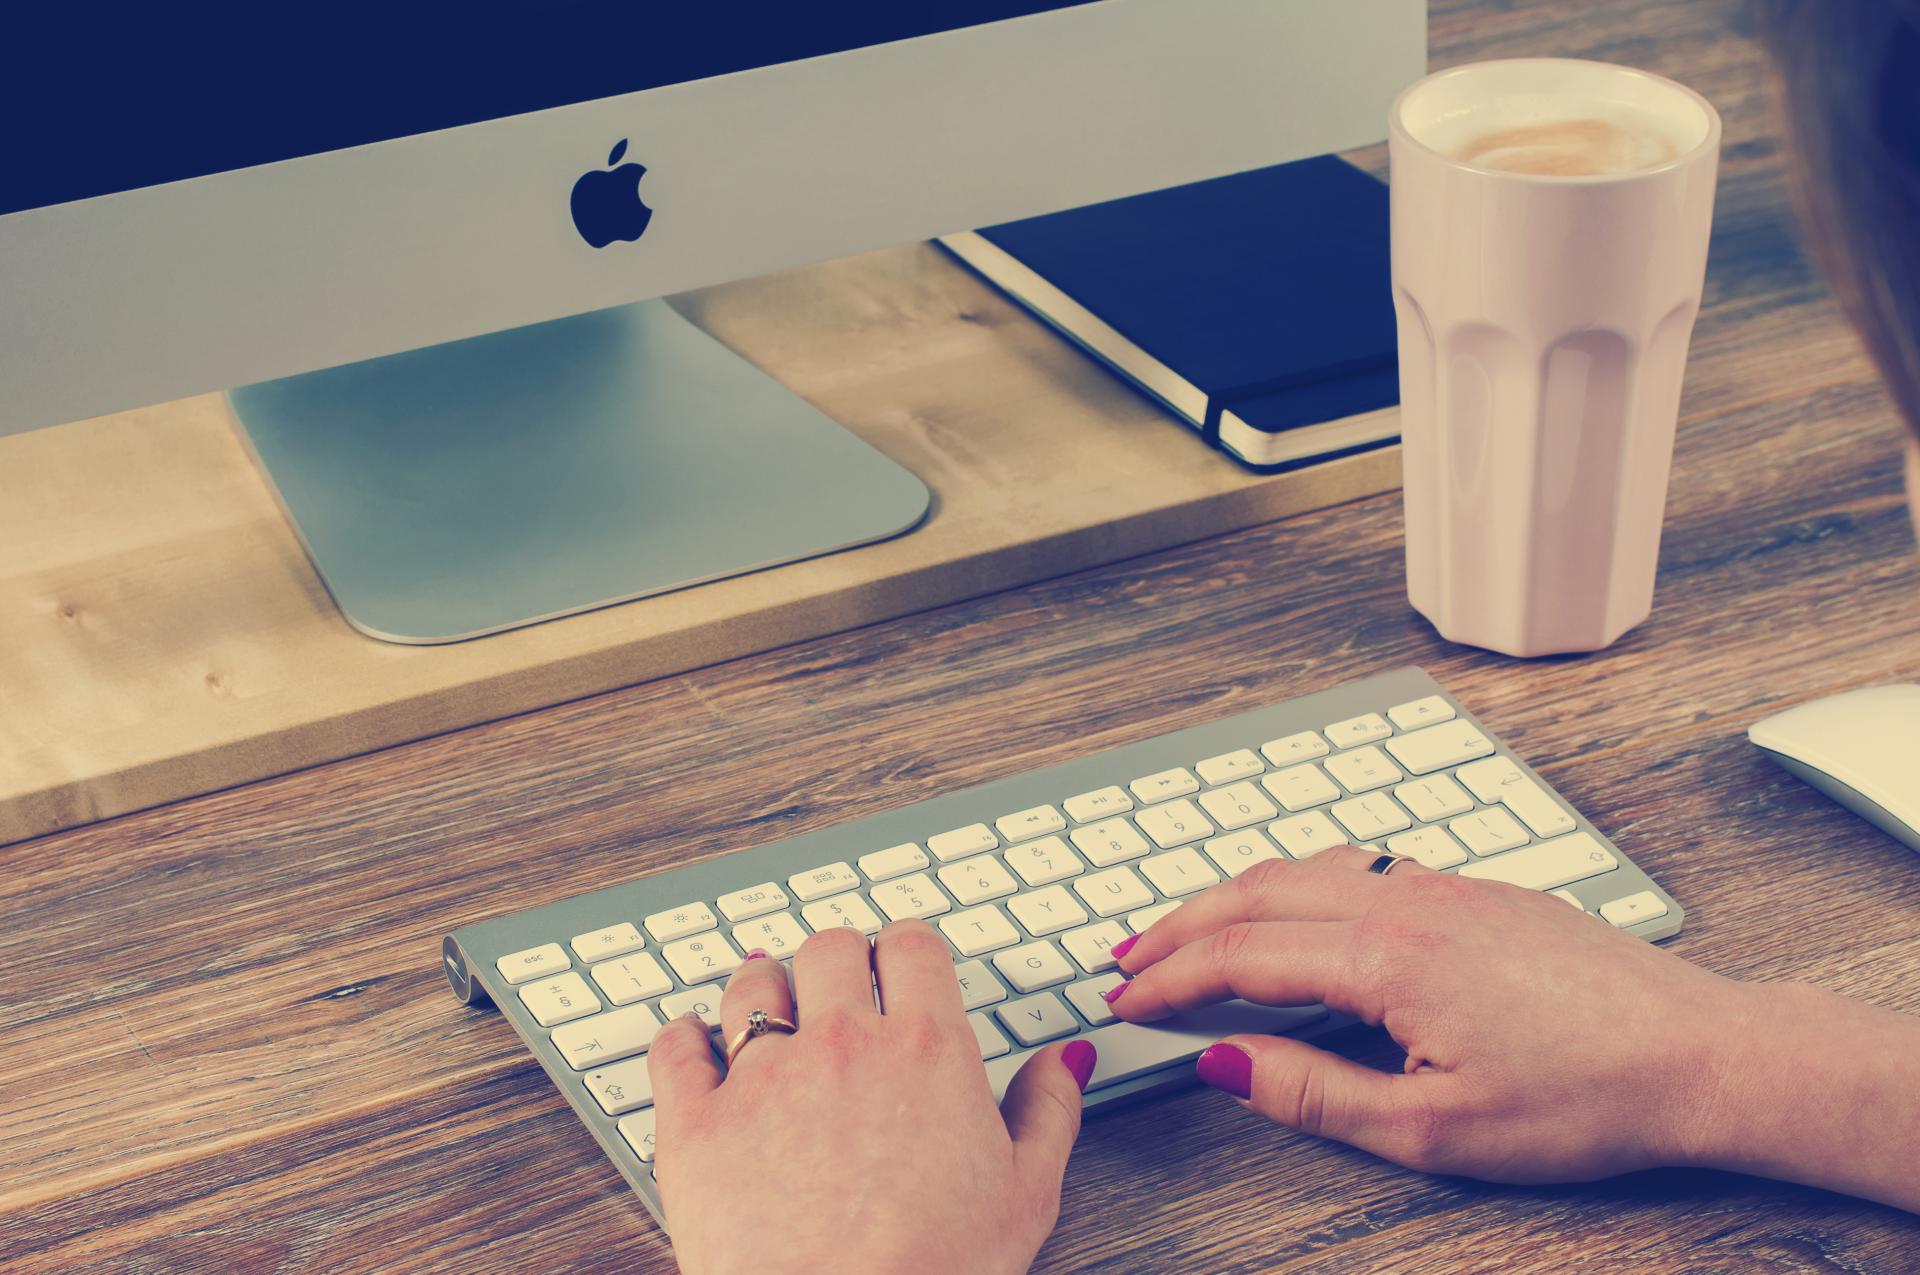 Macでコピペ。テキストの書式スタイルを解除する簡単な方法